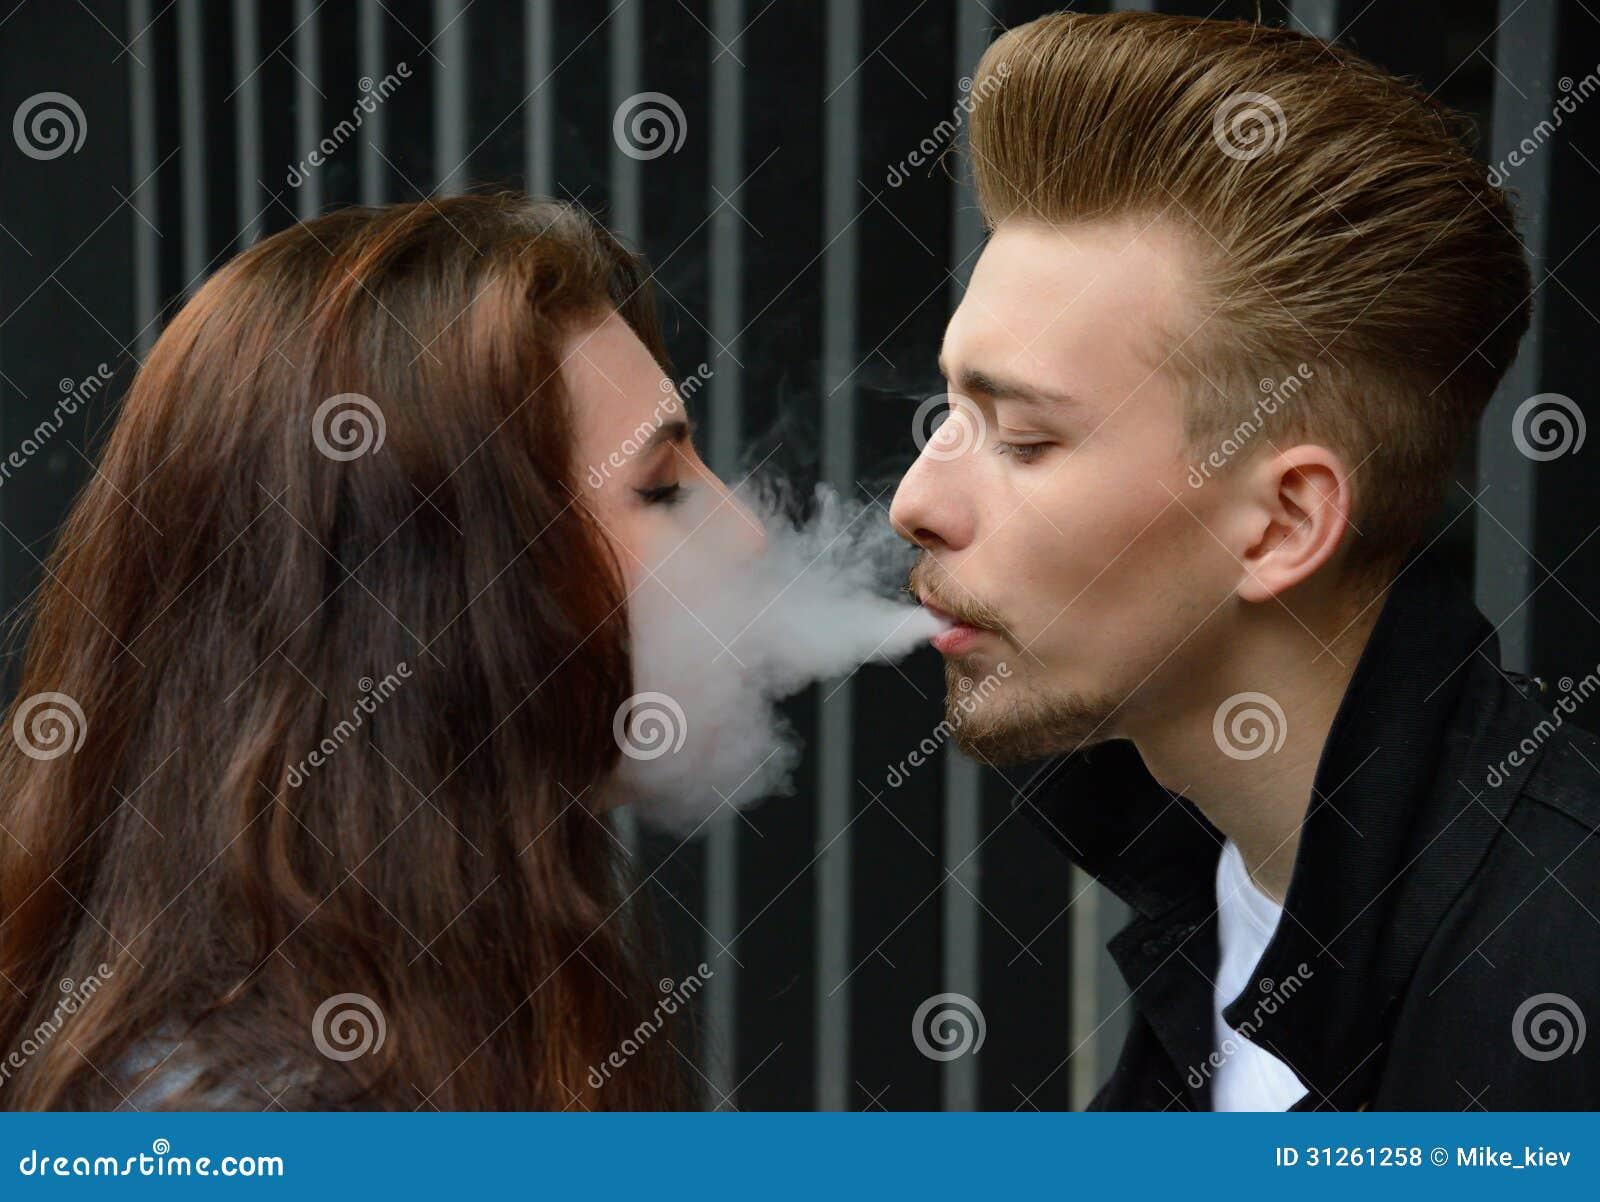 women kissing and smoking